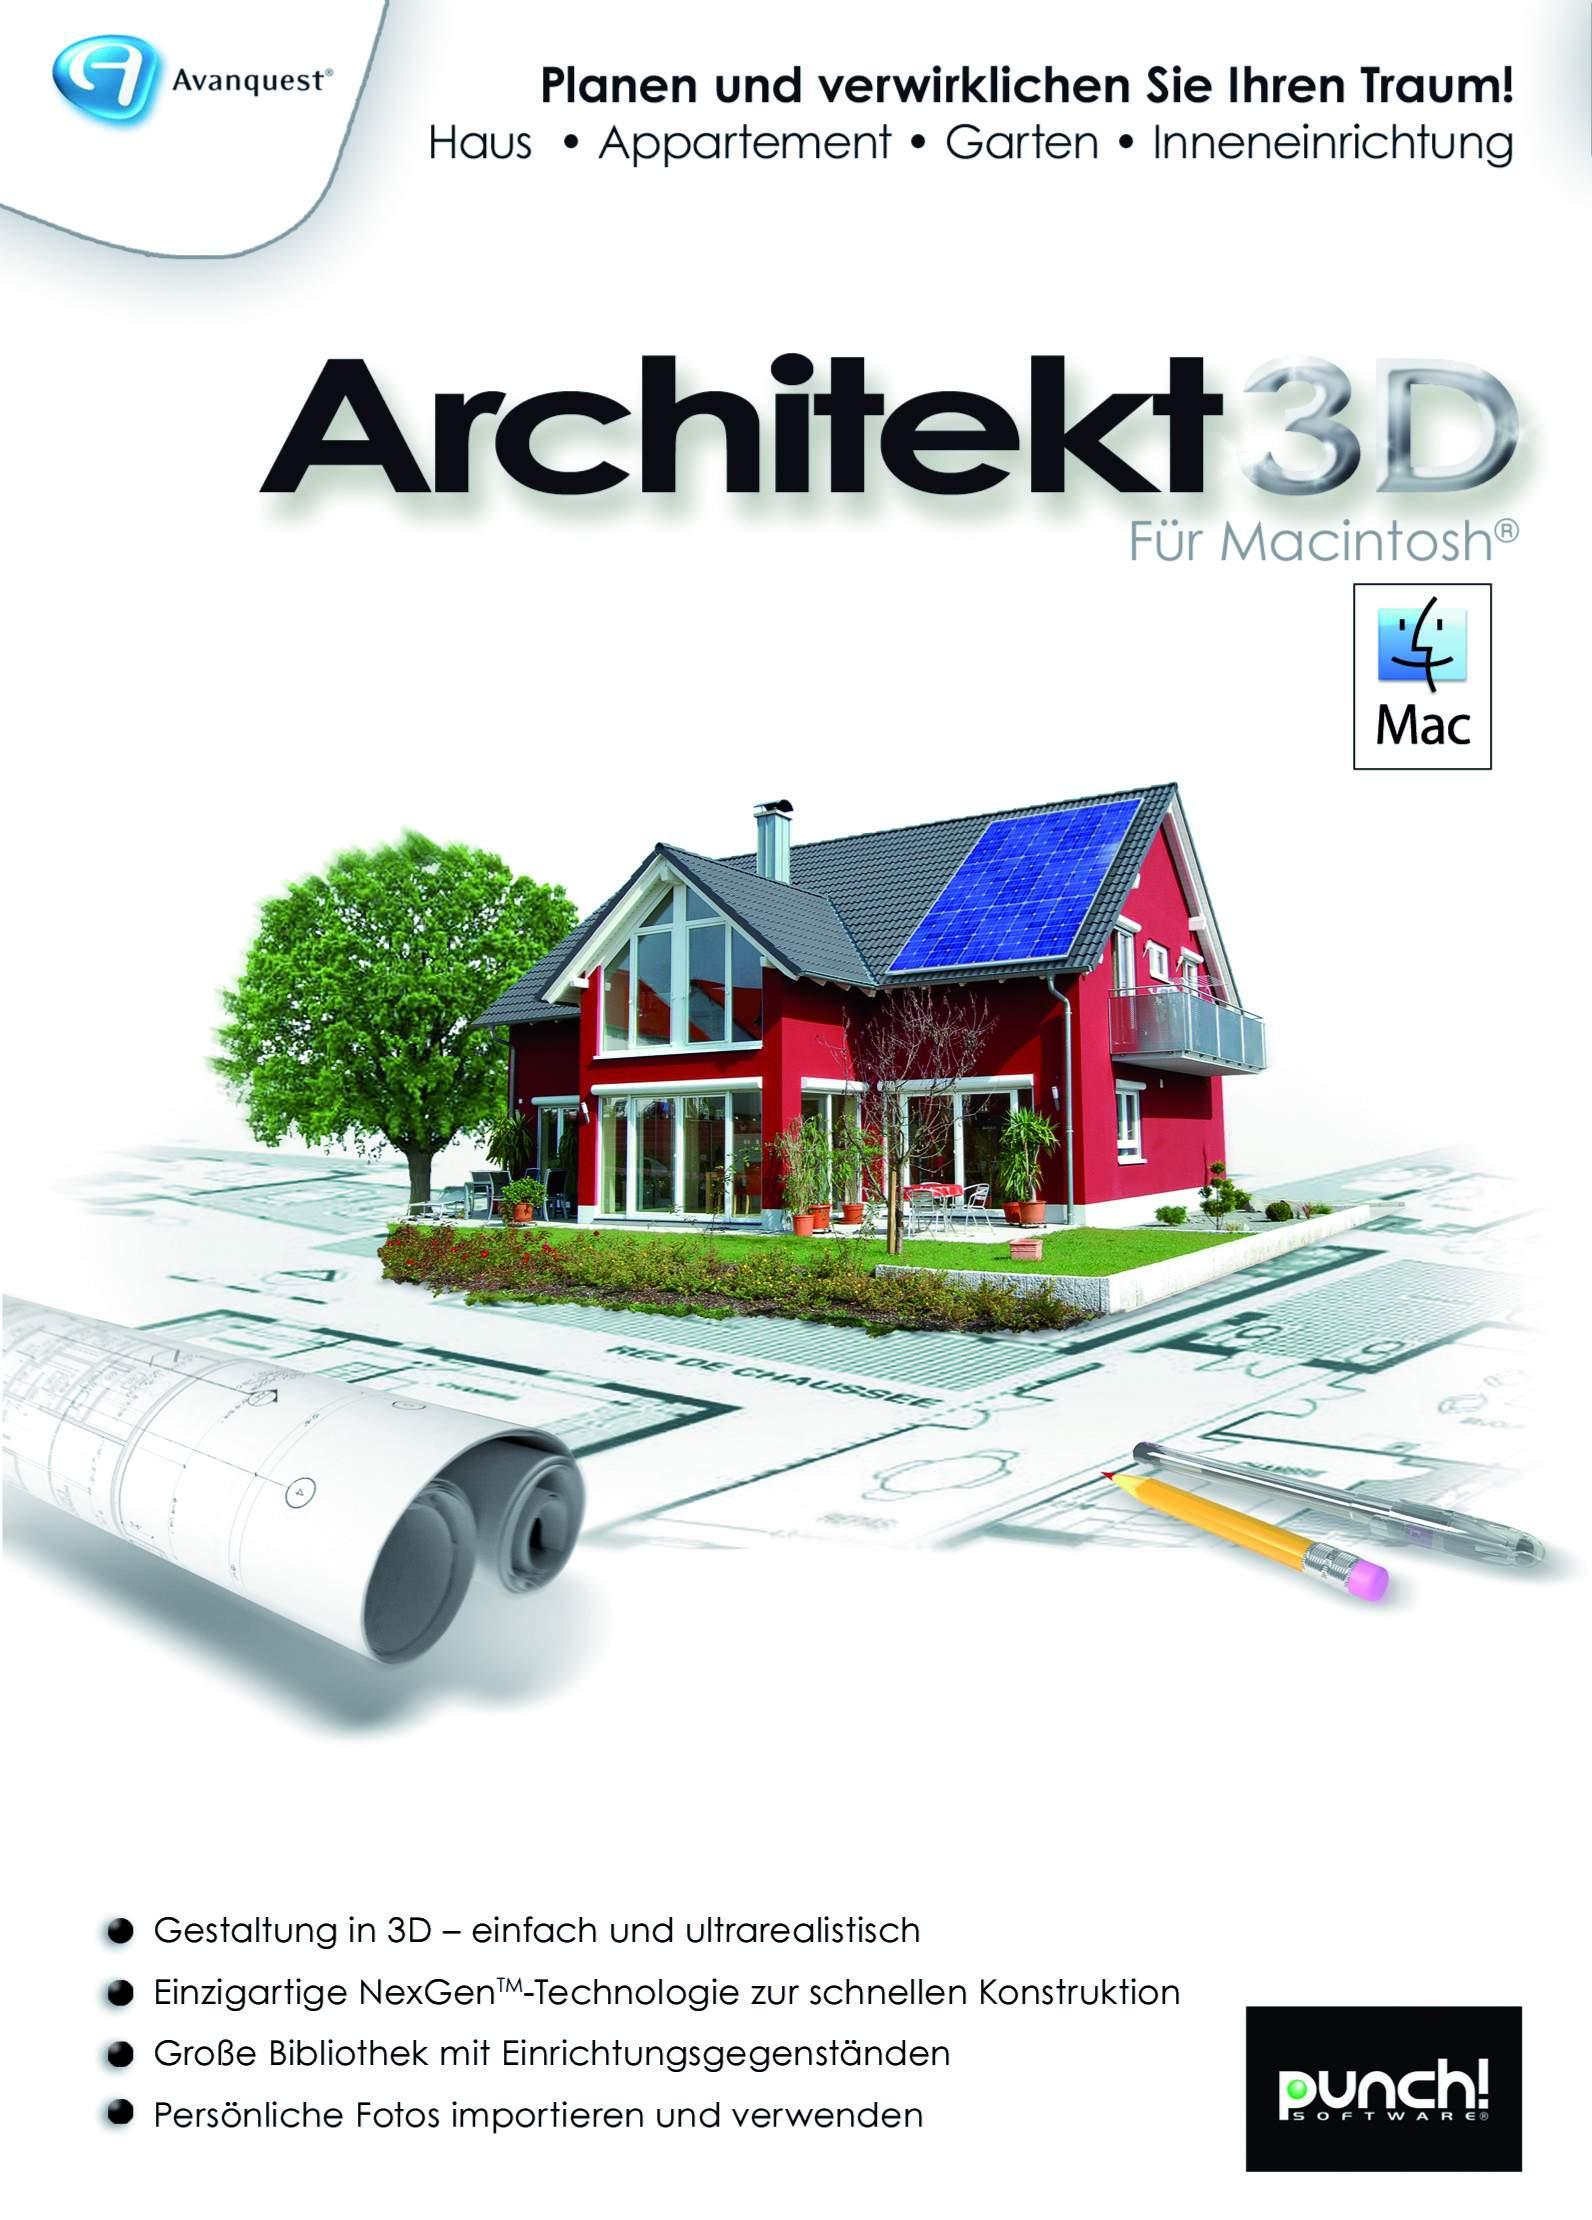 architekt 3d mac 2d front 300dpi cmyk